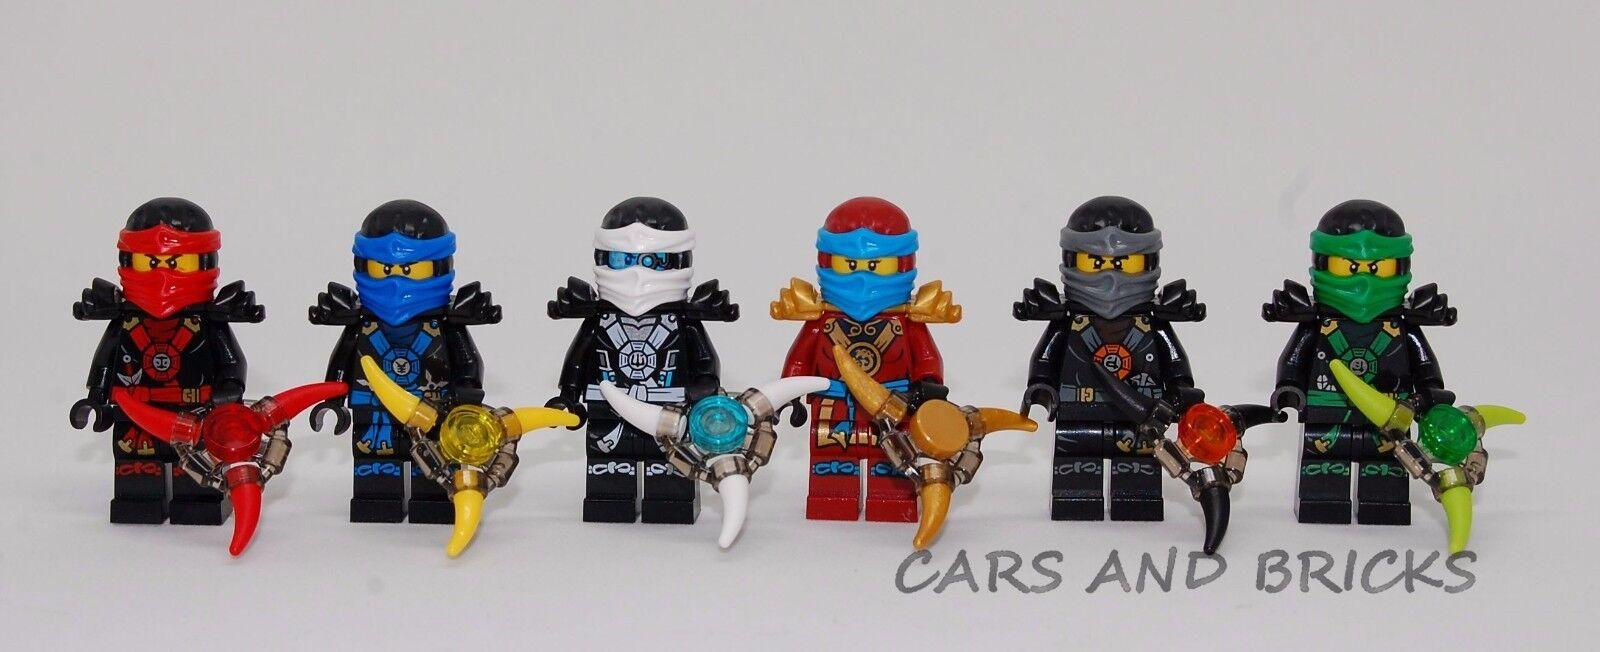 LEGO NINJAGO NINJA COLE JAY KAI LLOYD ZANE NYA MINIFIGURES W / WEAPONS NEW